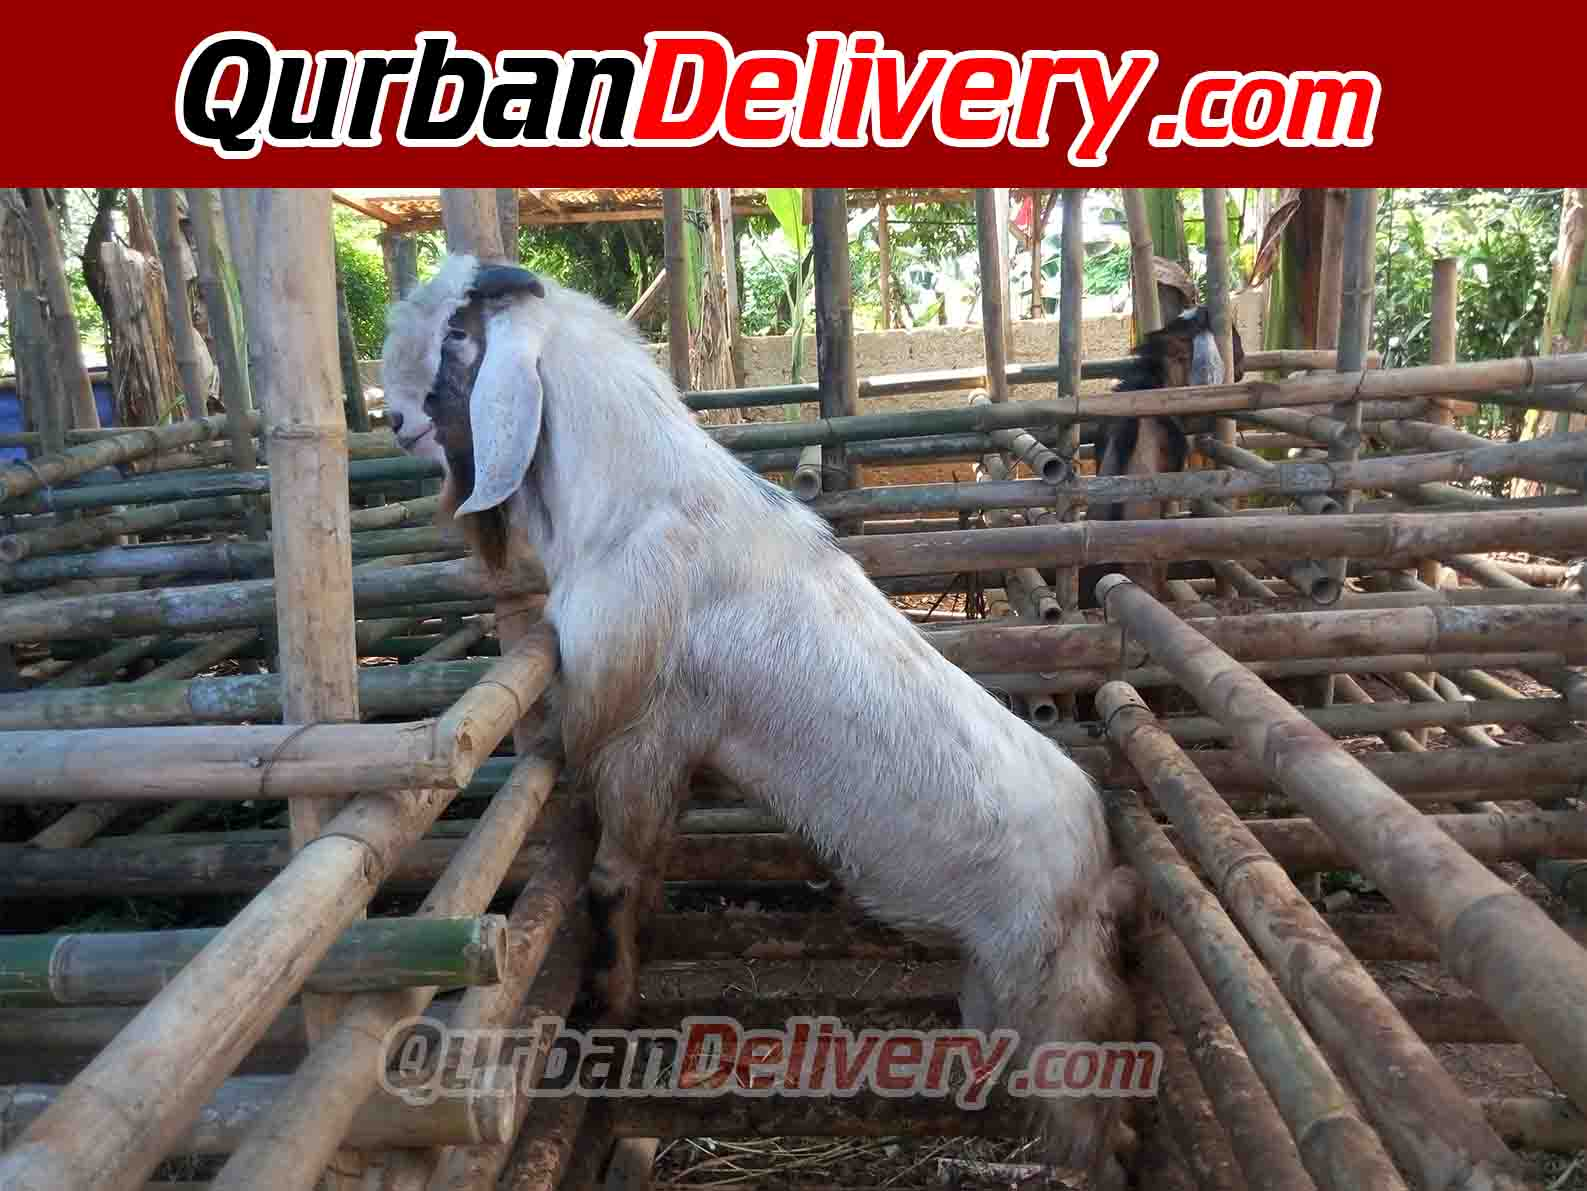 Harga Sapi Bali Qurban Murah Prediksi 2020-Qurban Delivery